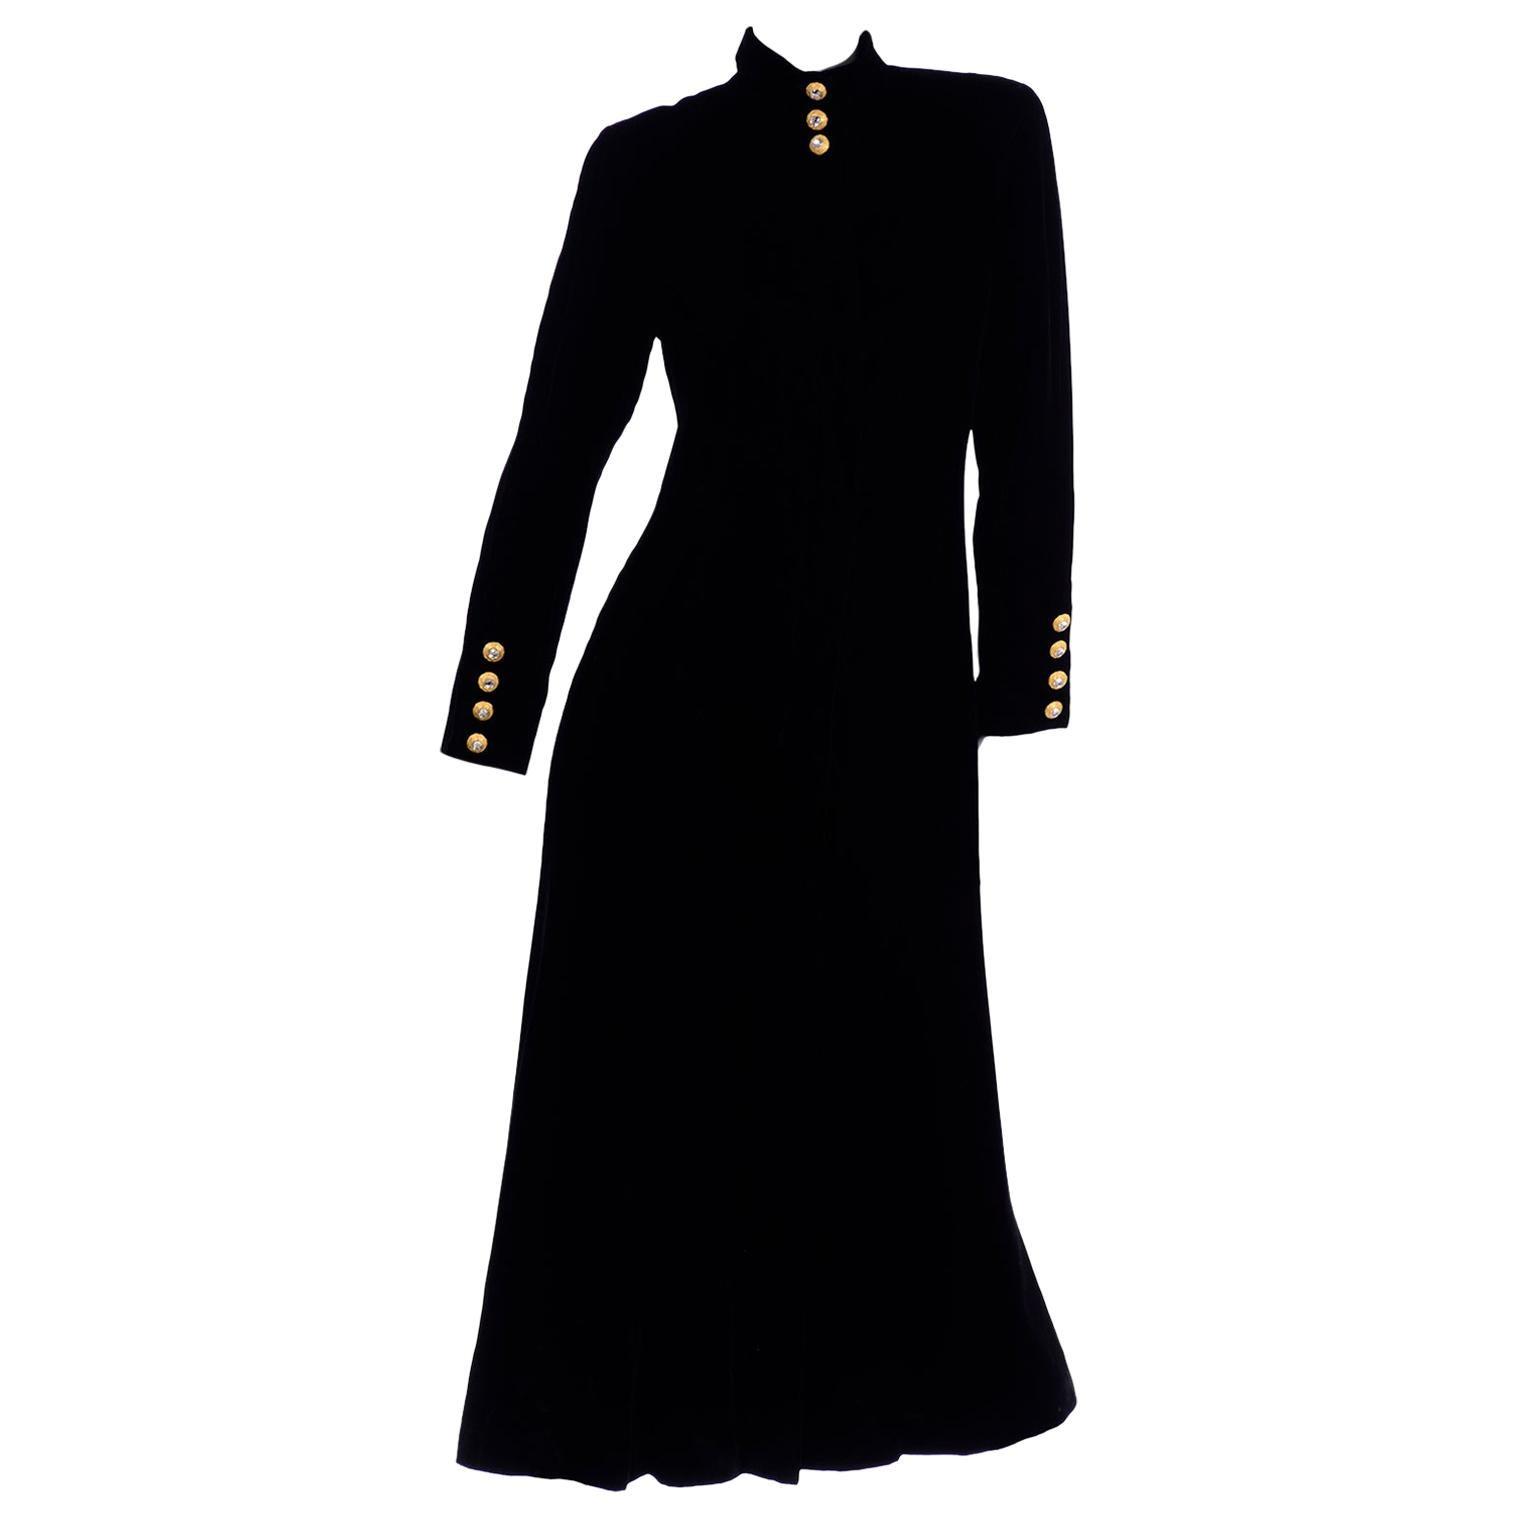 Vintage Black Velvet Long Coat with Gold Rhinestone Buttons